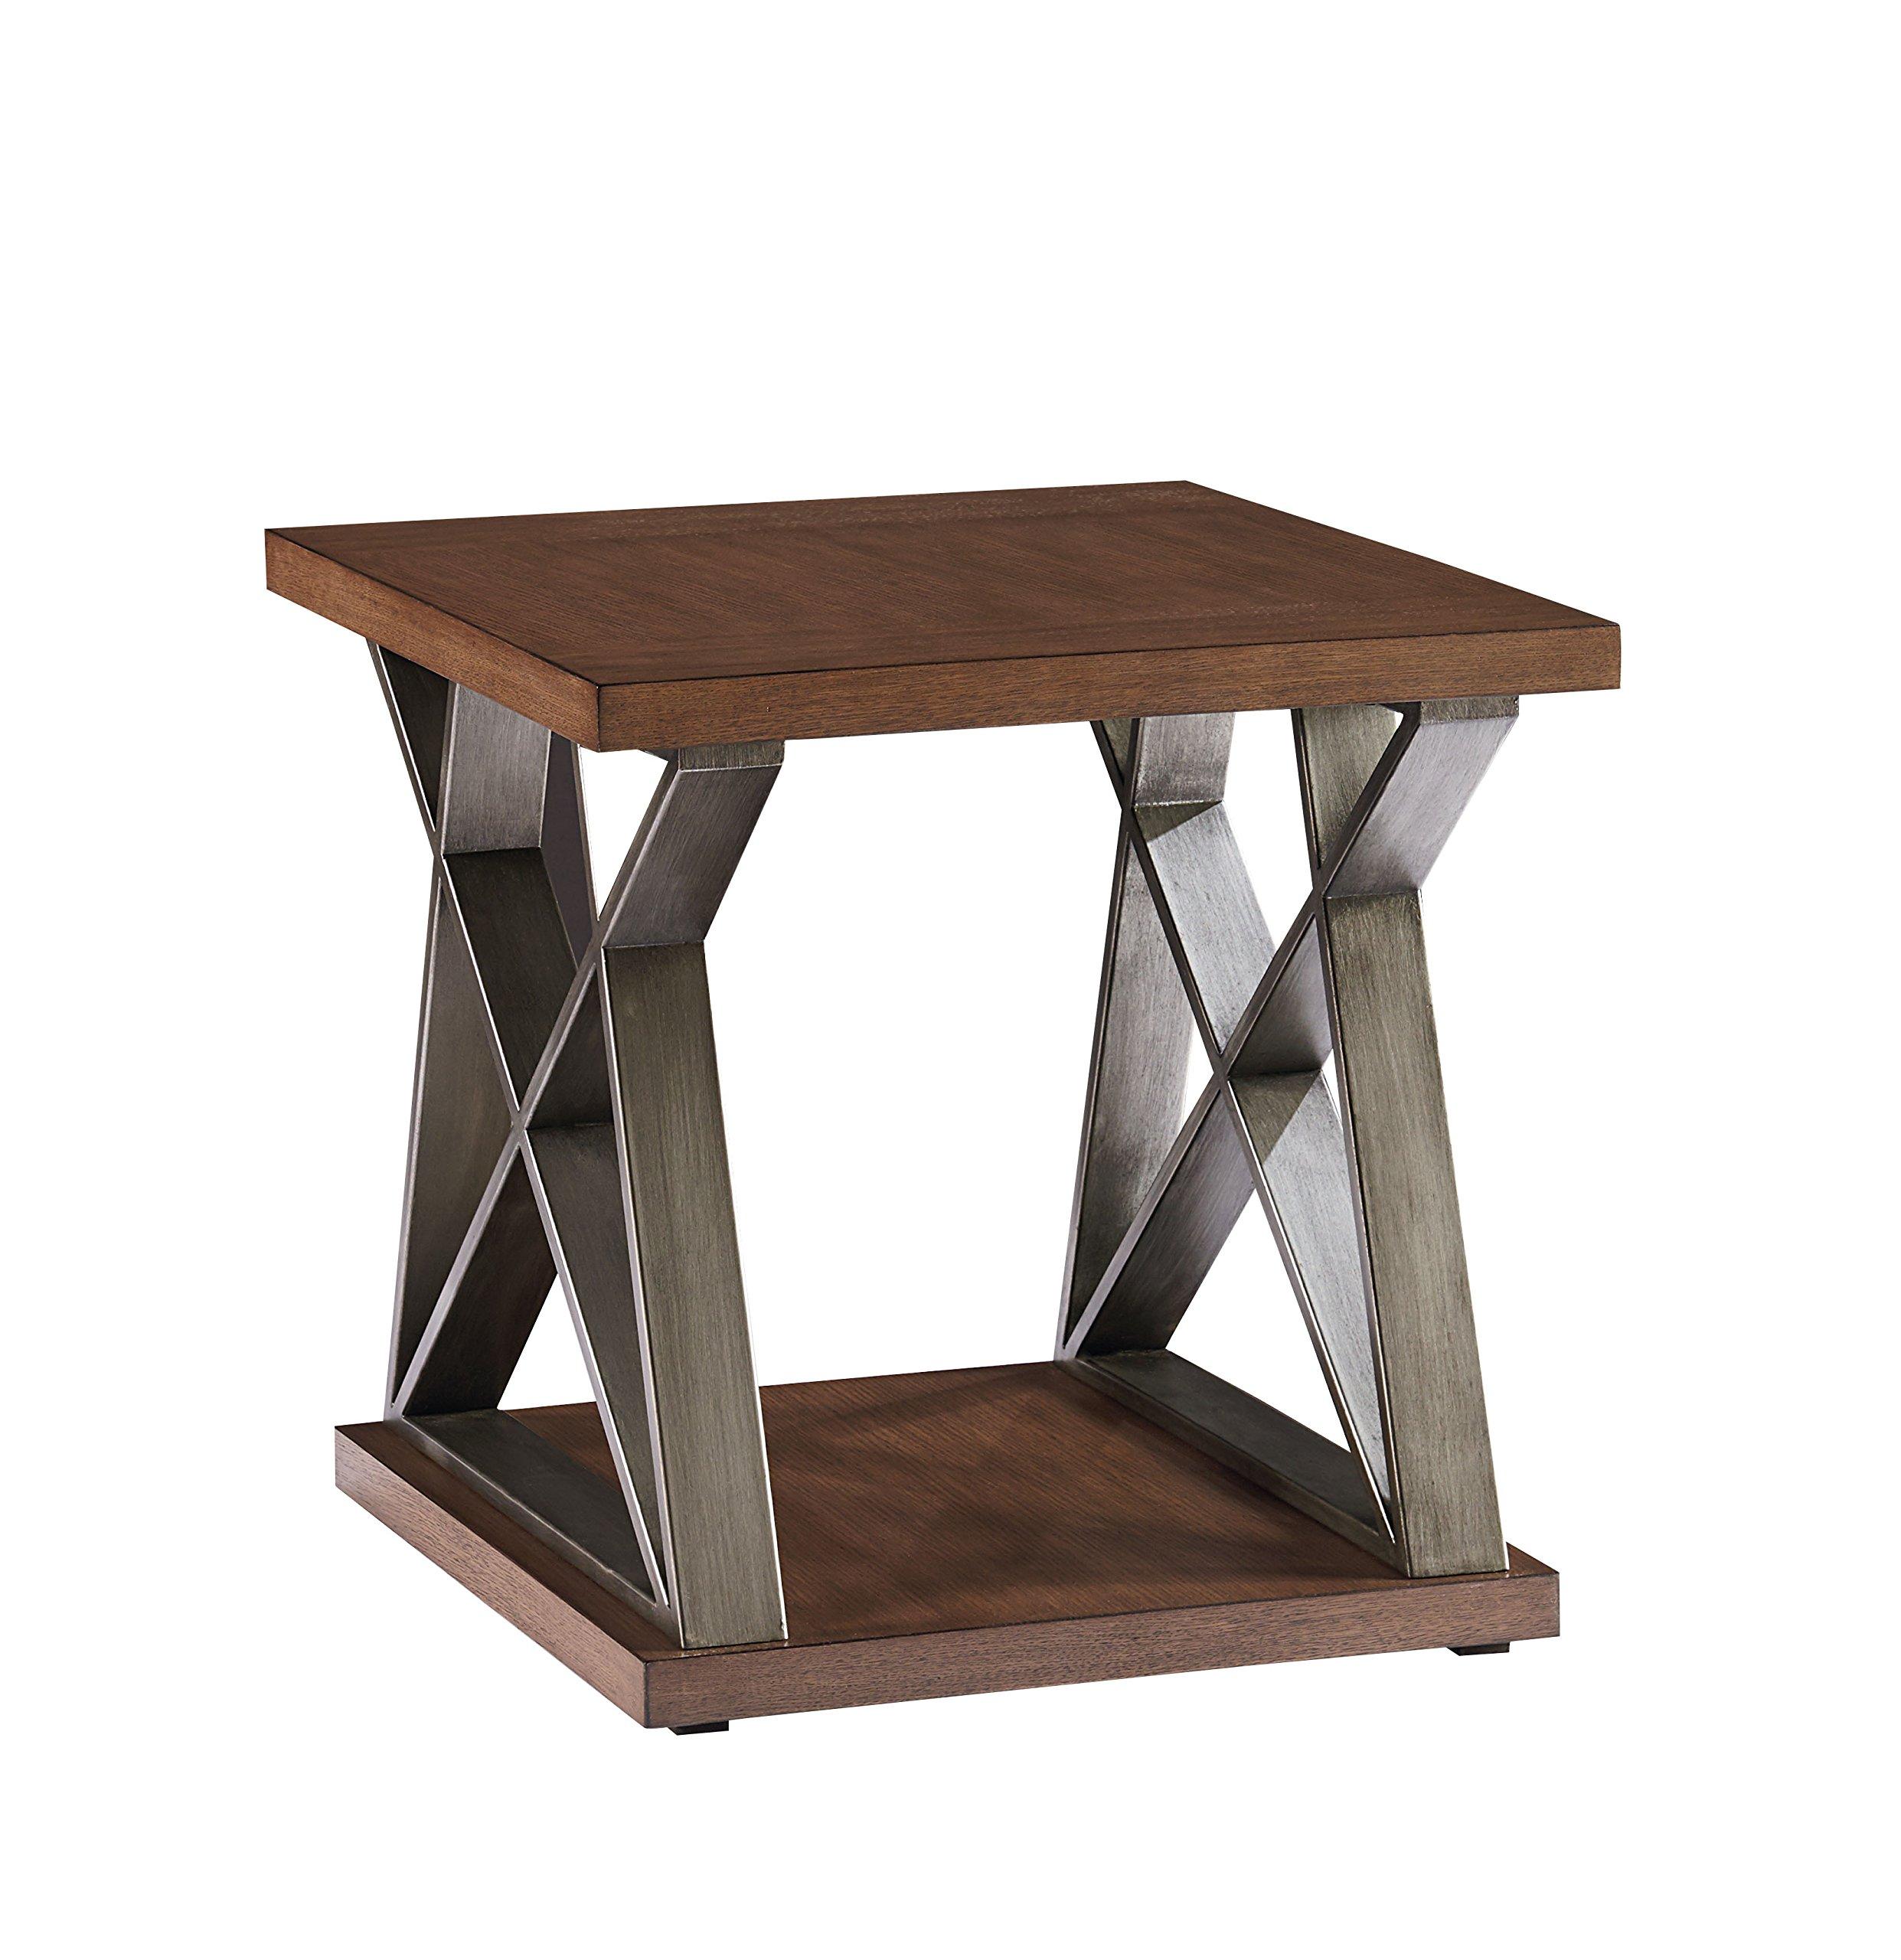 Standard Furniture 29962 Cumberland End Table by Standard Furniture